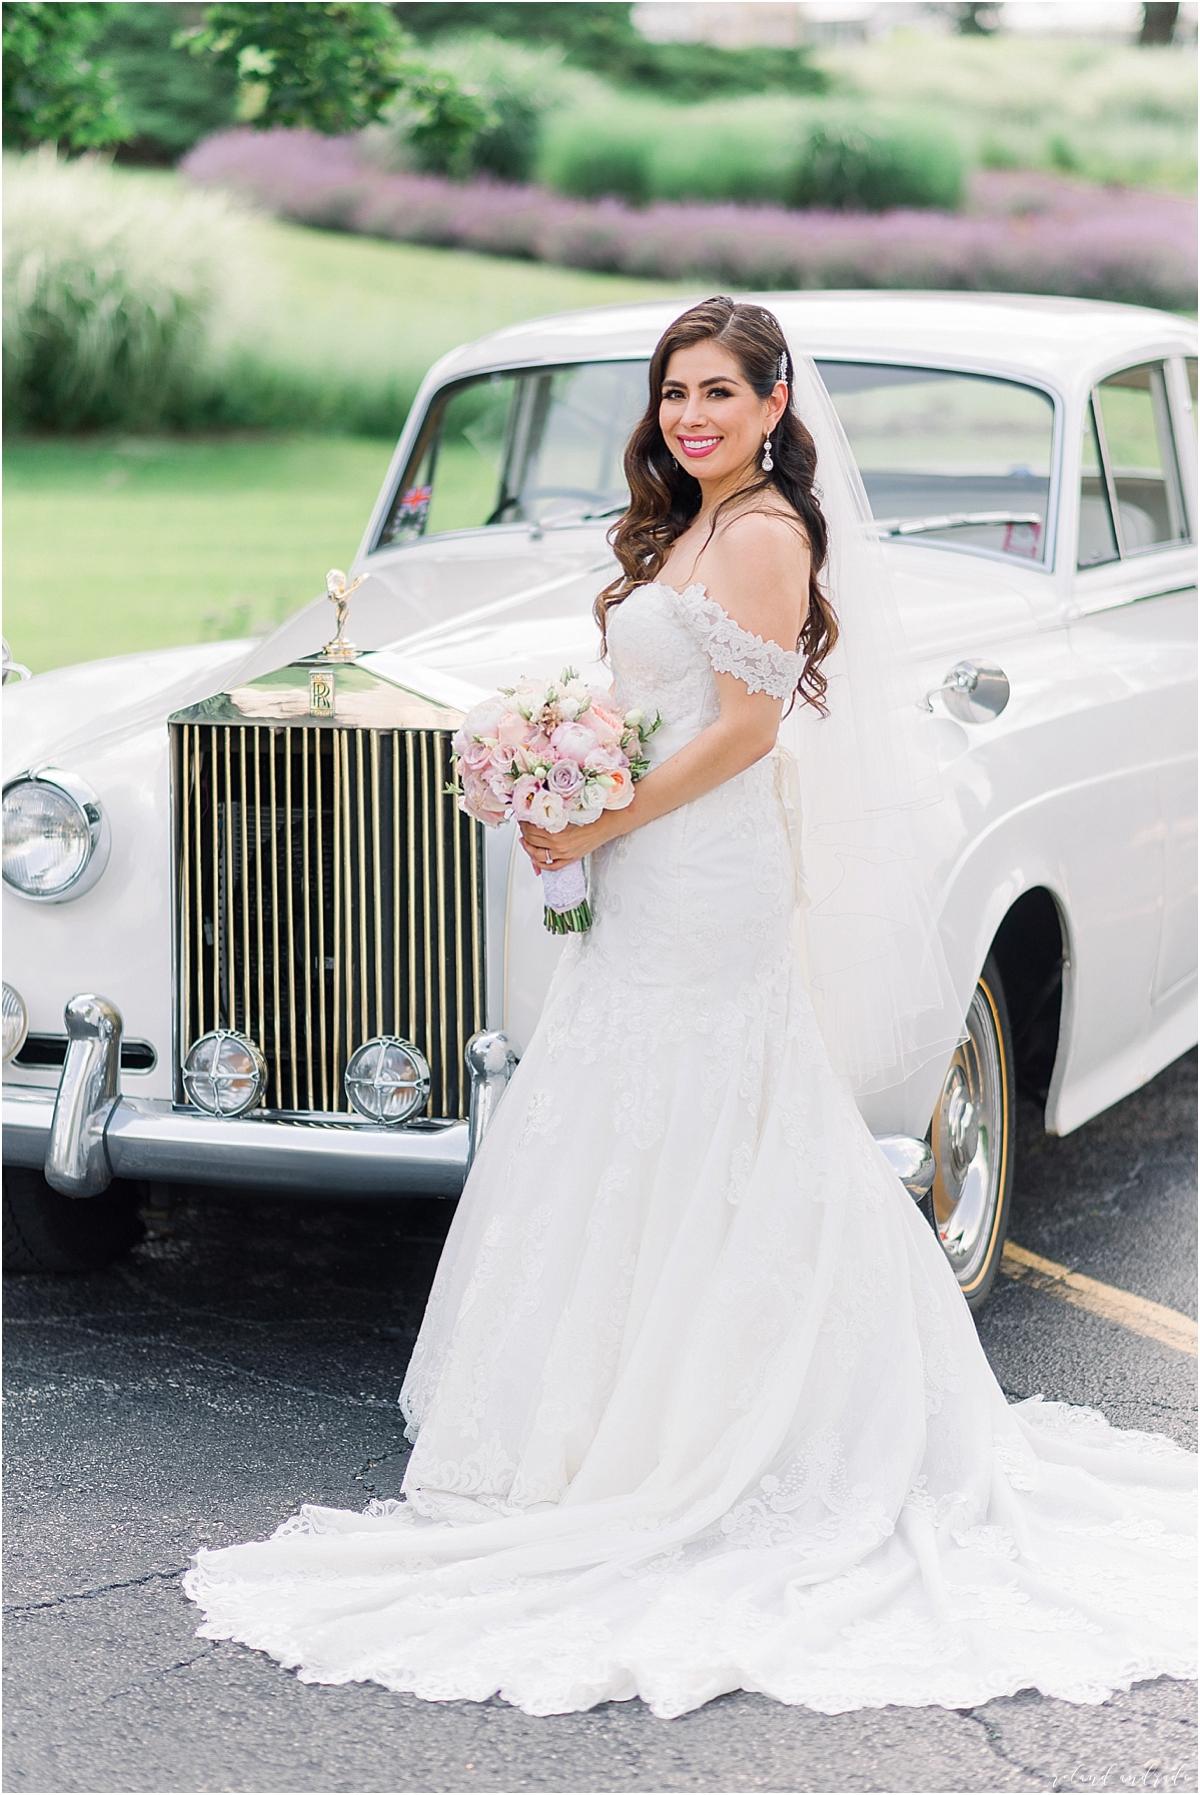 Rancho Los Guzman Wedding Joliet, Joliet Wedding, Joliet Wedding Photographer, Chicago Wedding Photographer, Best Photographer In Joliet, Best Photographer In Chicago, Light And Airy Photographer Chicago_0046.jpg